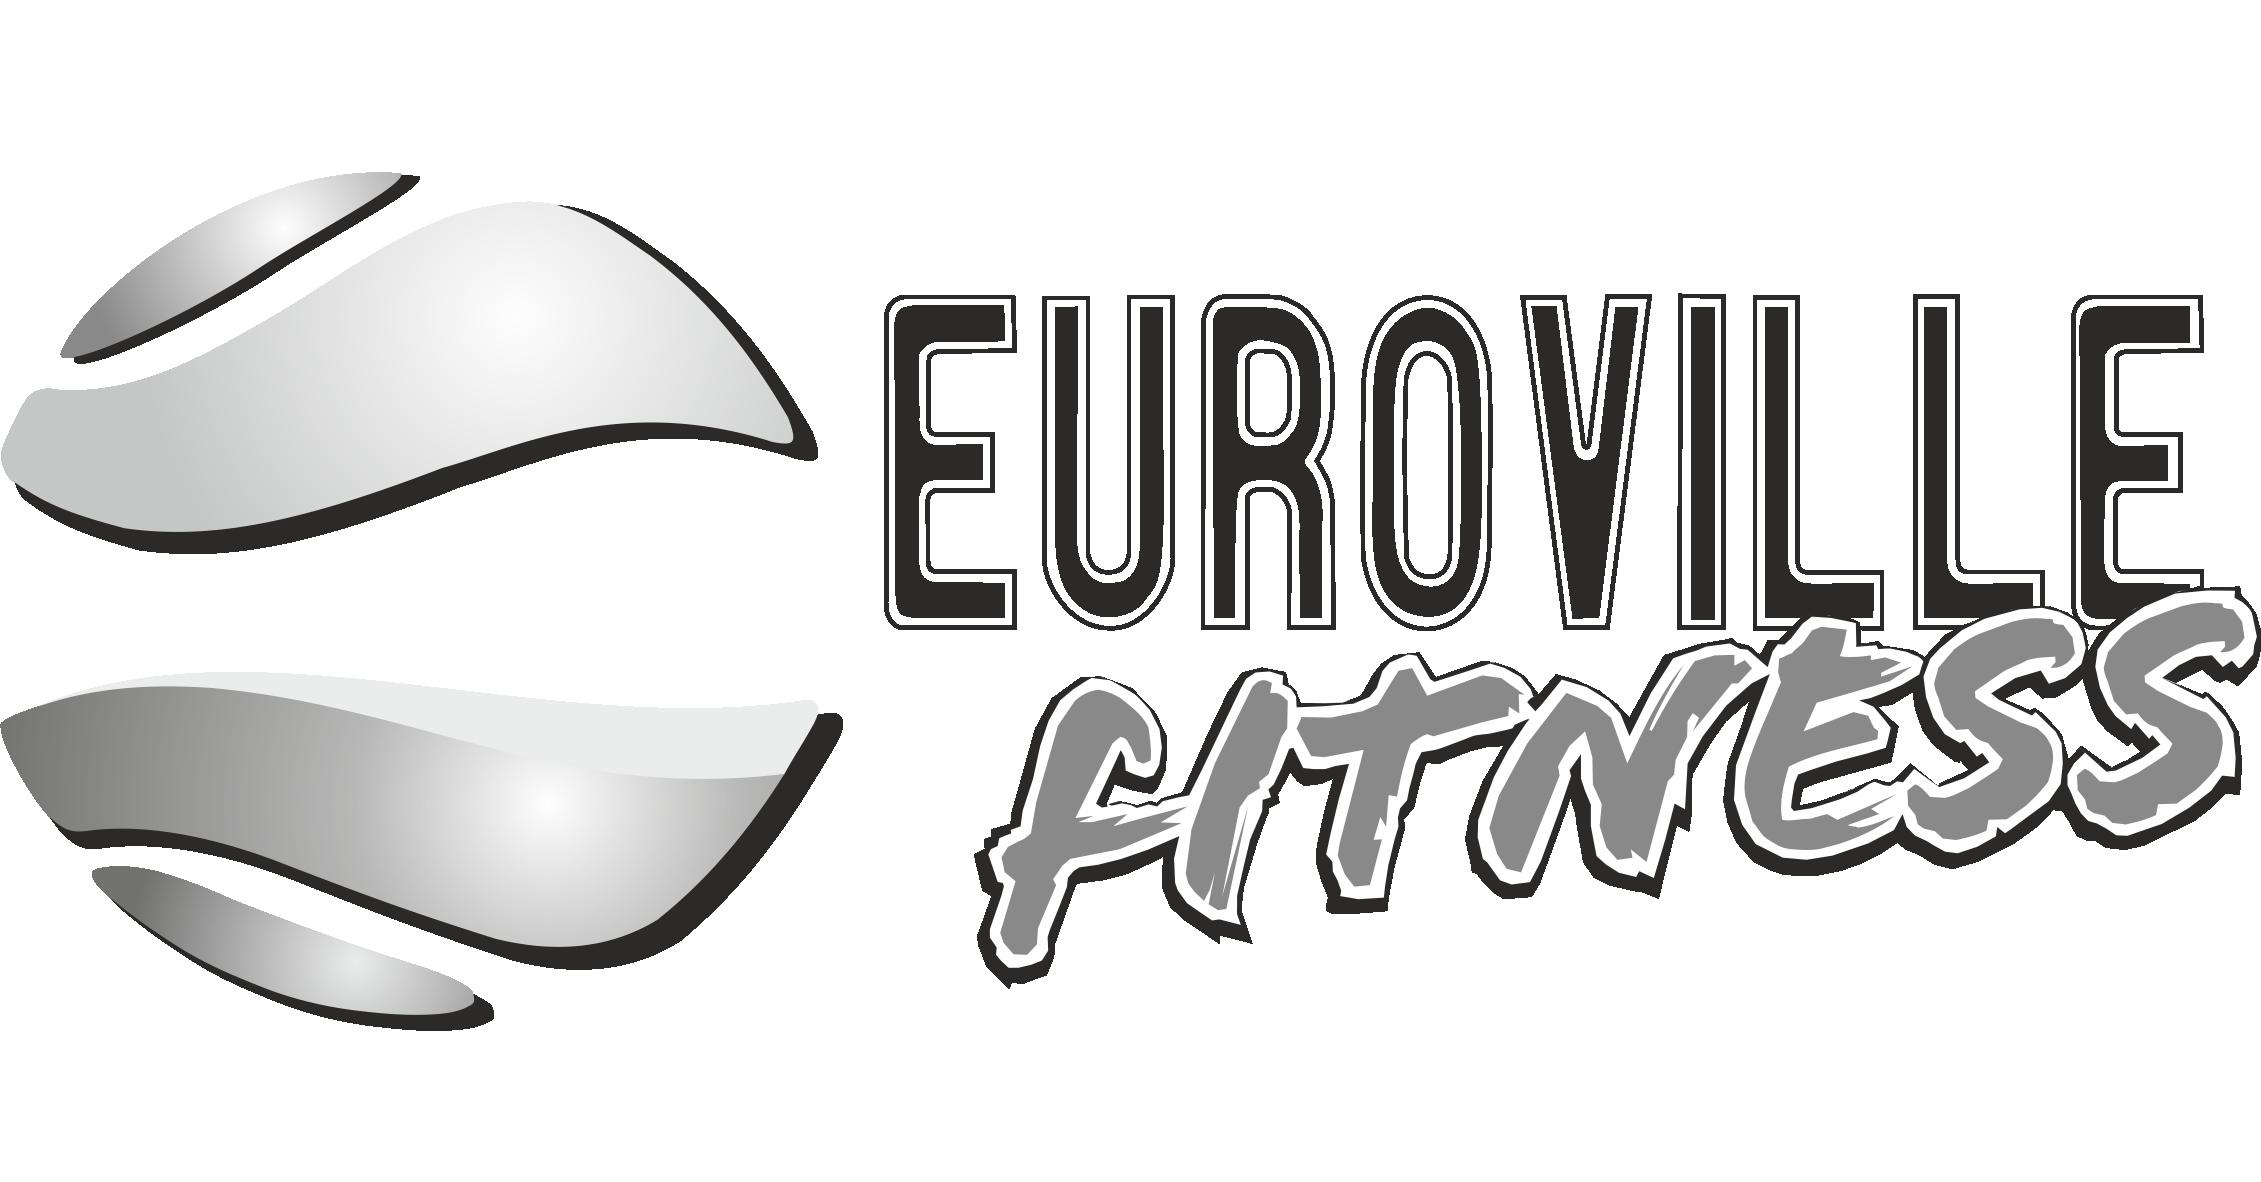 Euroville-Fitness